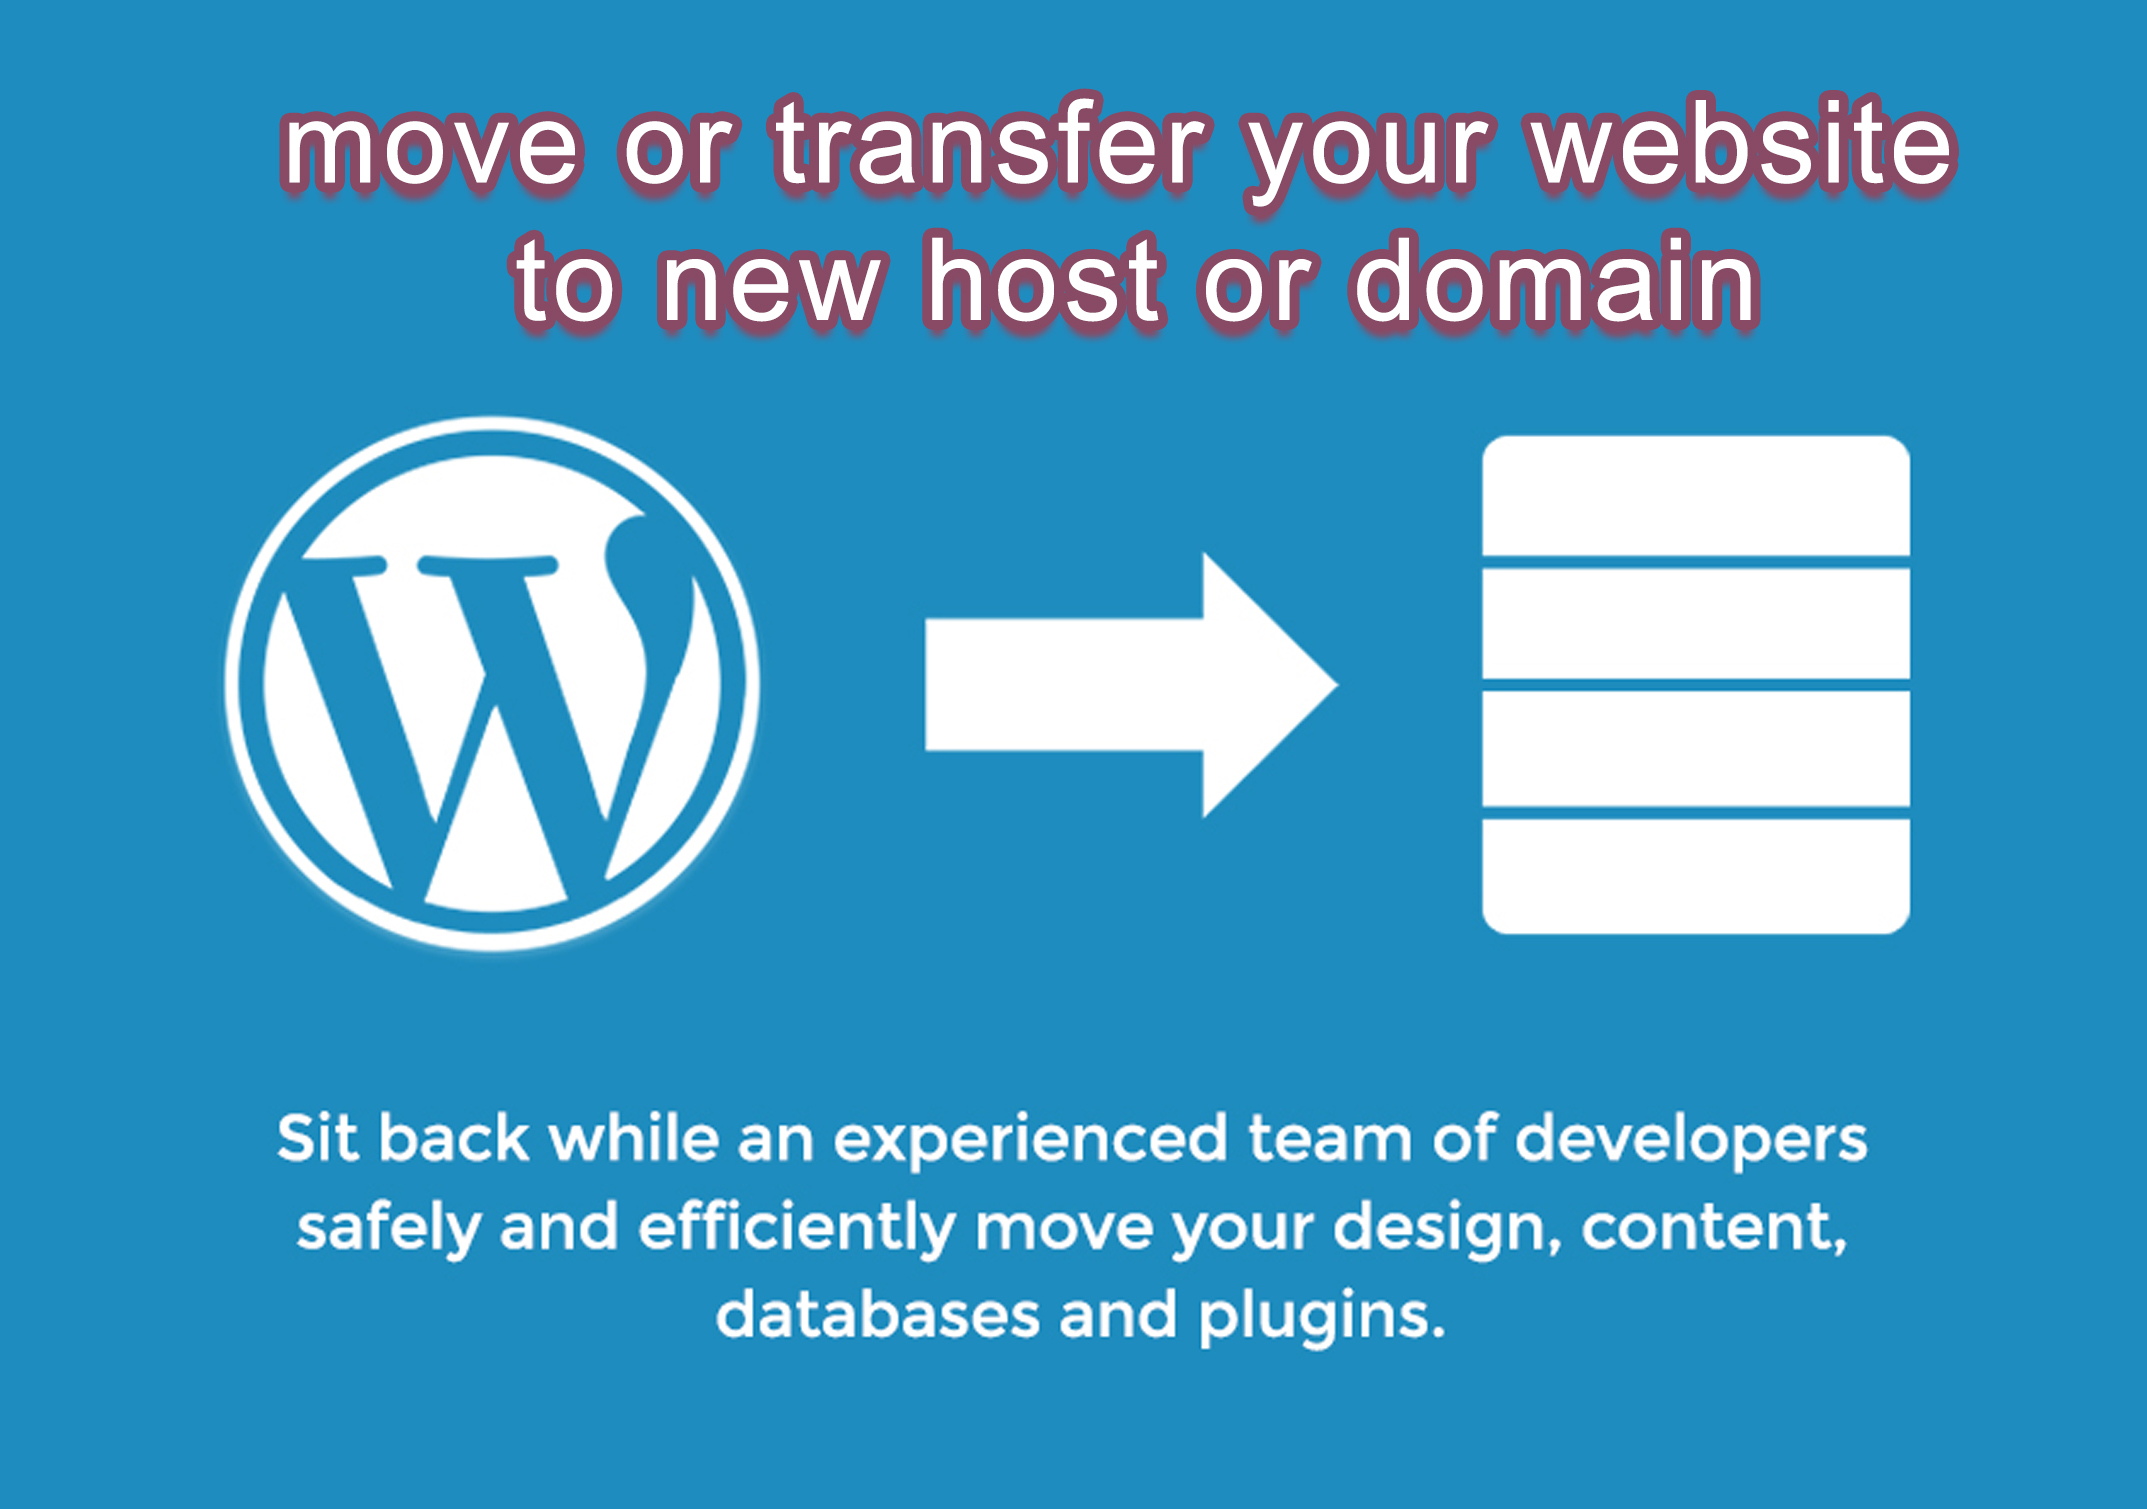 backup, migrate or transfer wordpress website